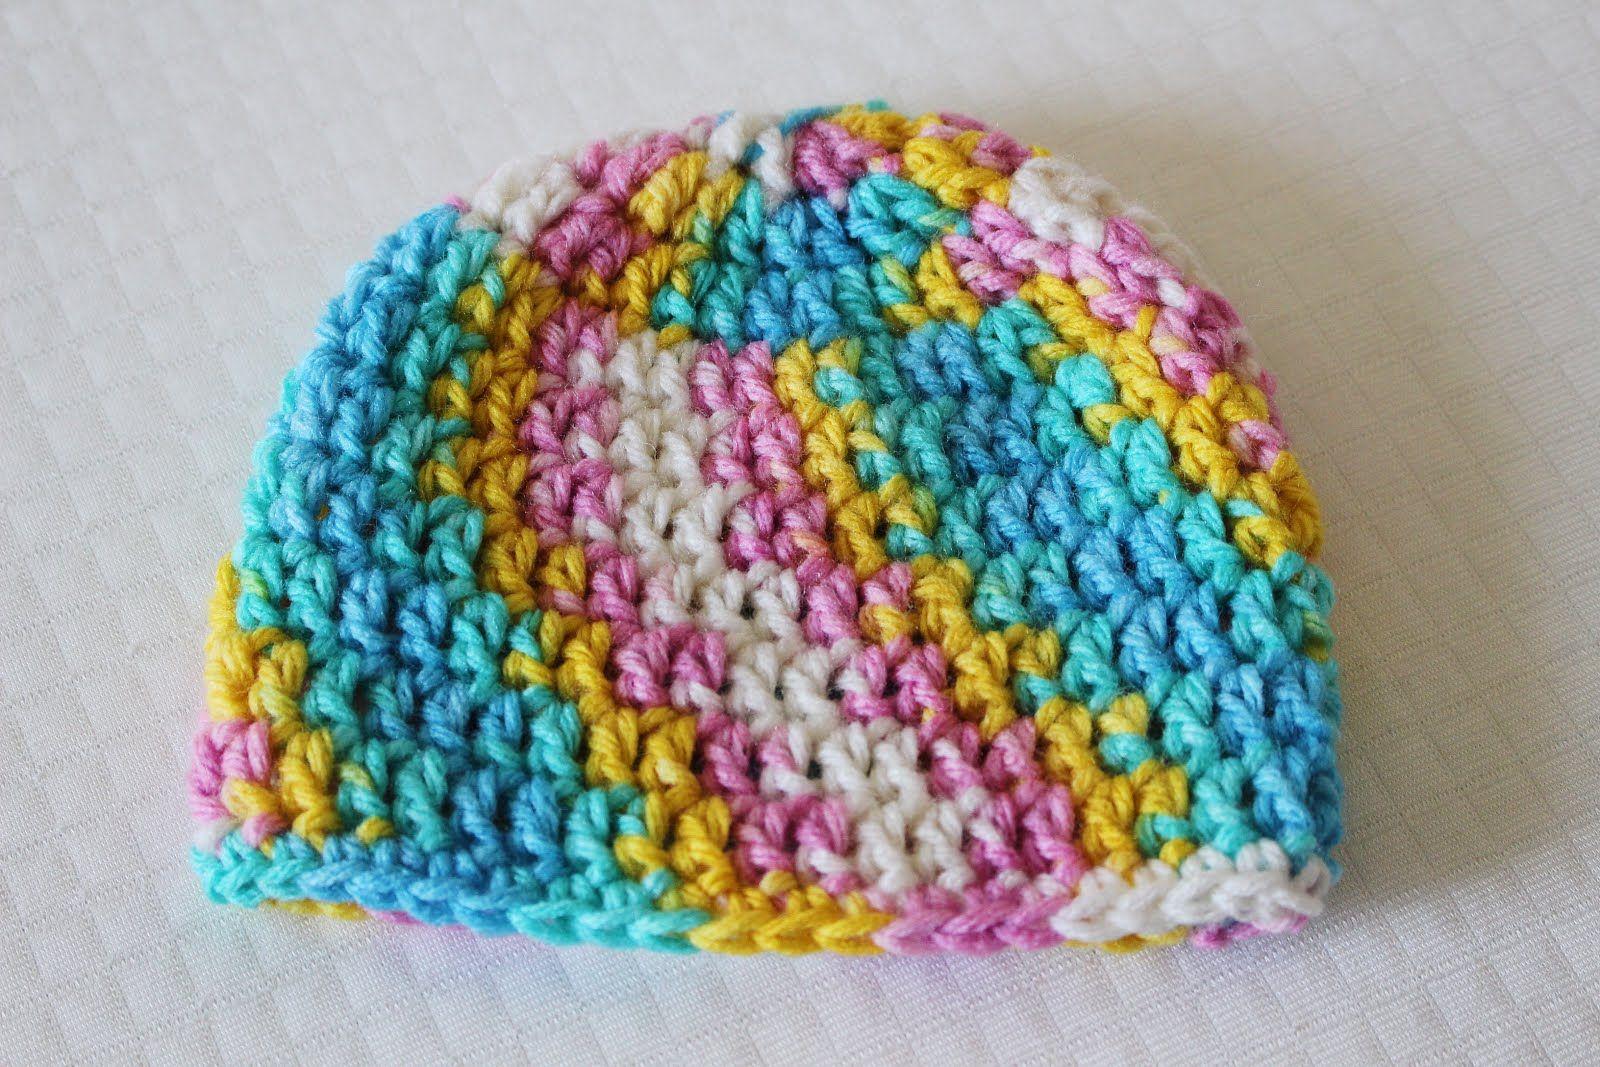 30 Minute Crochet Newborn Baby Beanie | Crochet, 30th and Babies